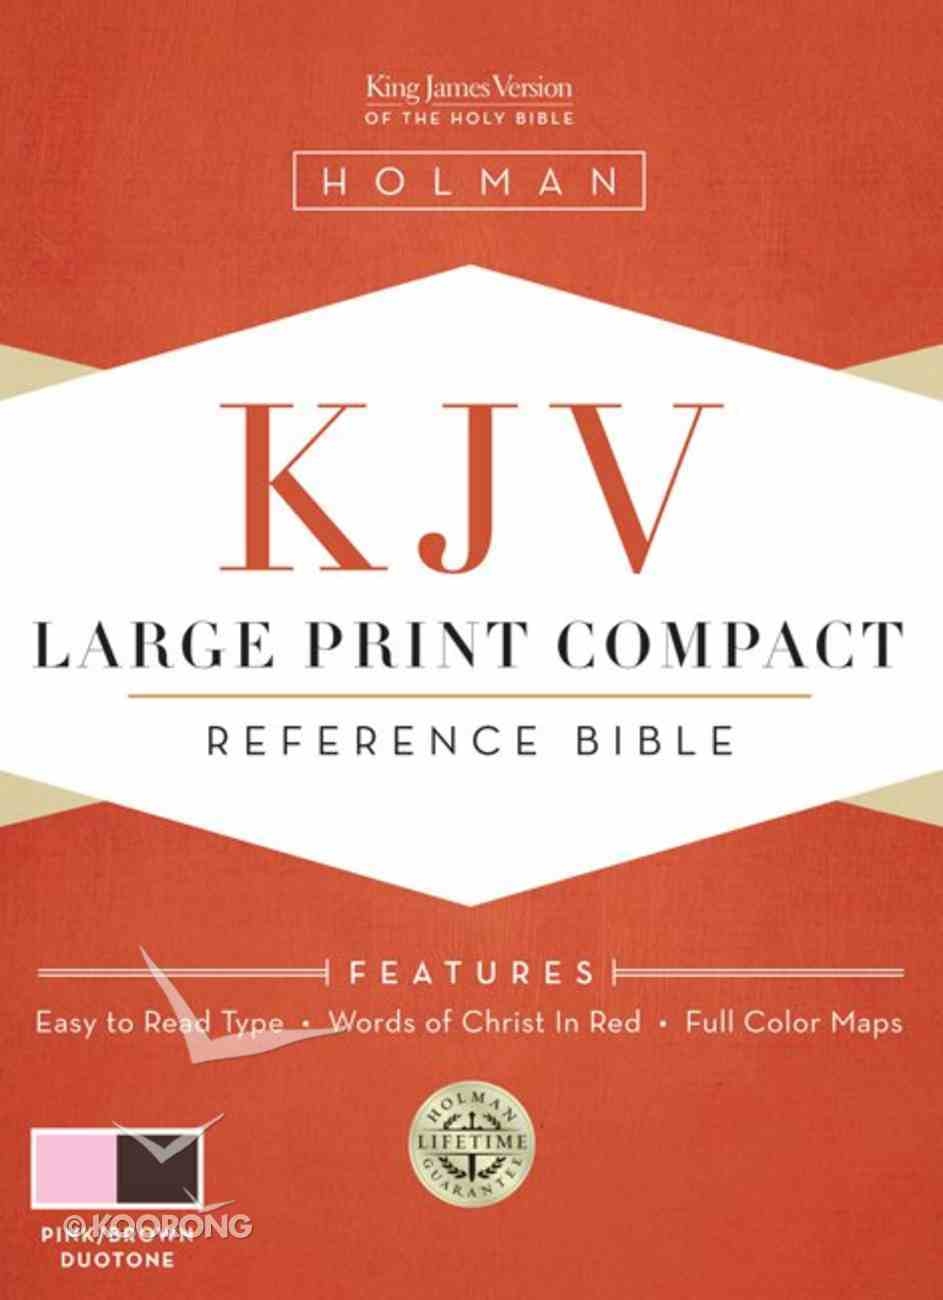 KJV Large Print Compact Bible Pink/Brown Imitation Leather